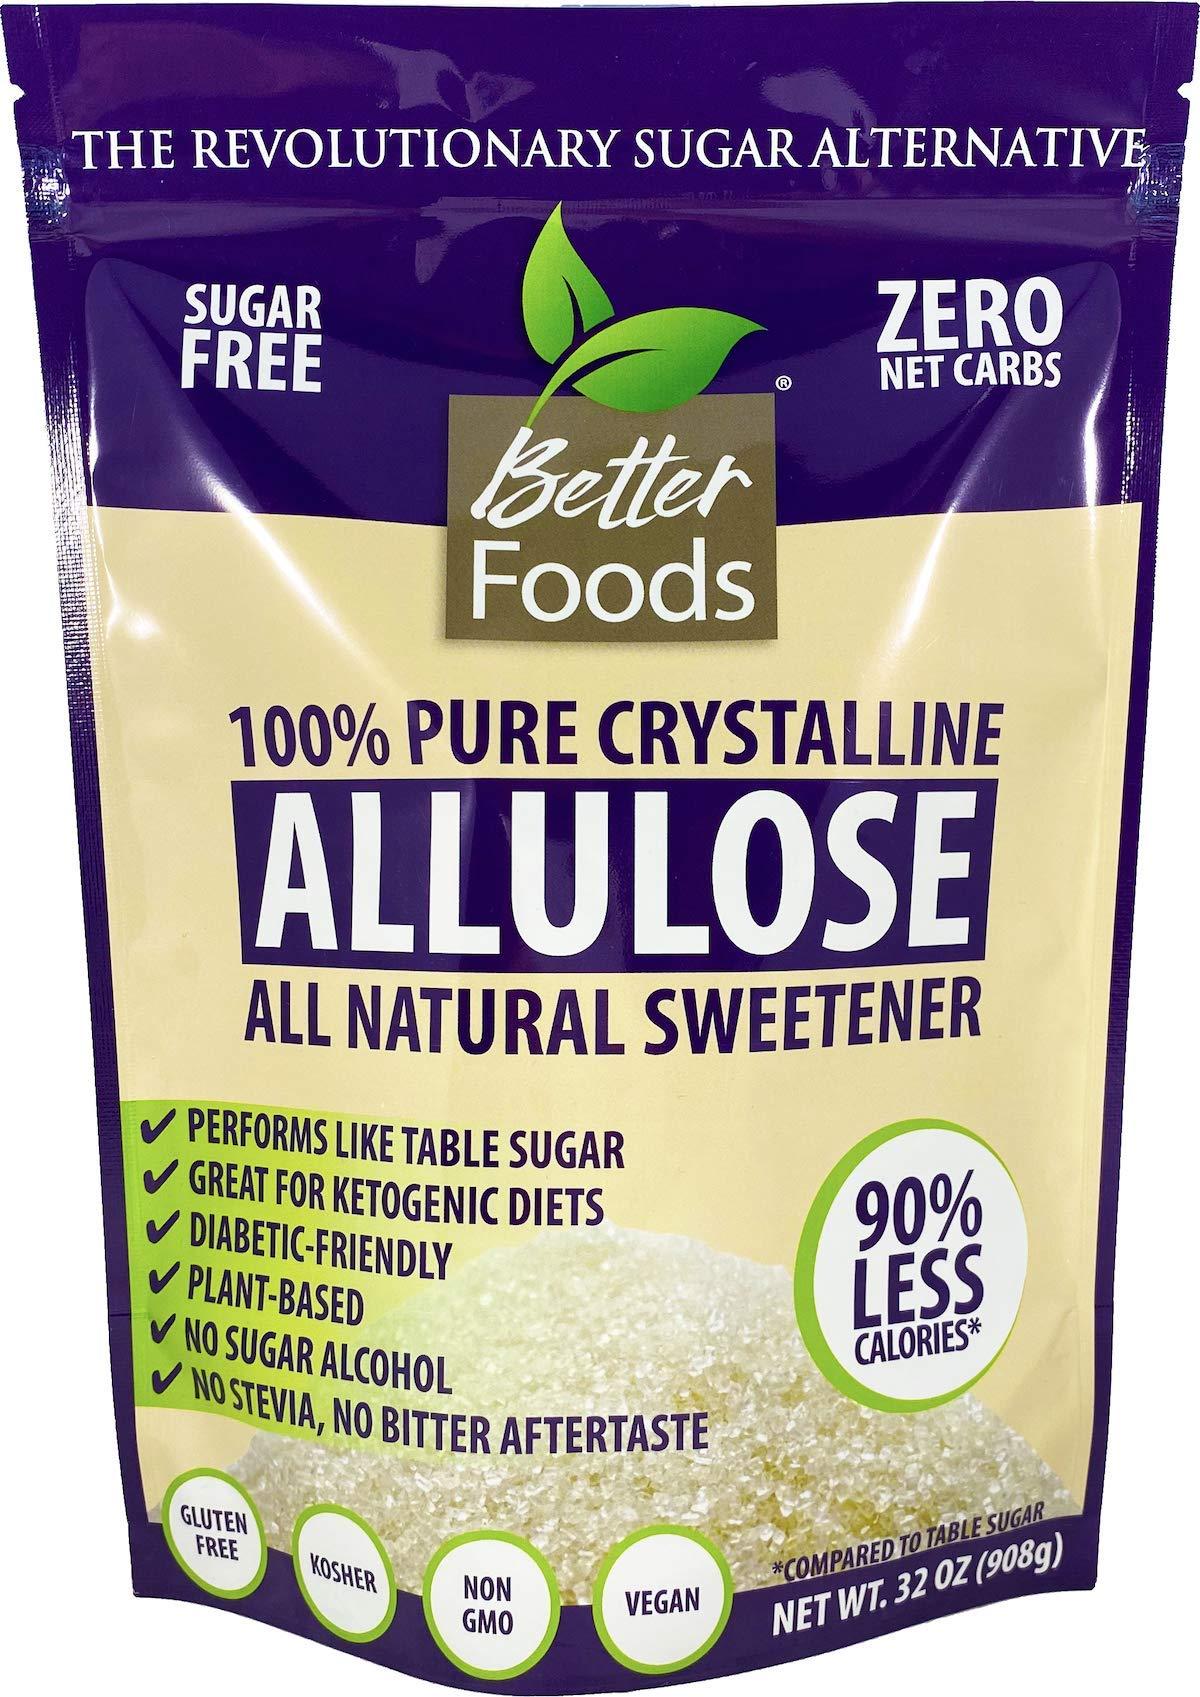 Allulose Non-GMO 32 oz 2 LBS Pure Crystalline Powder Sugar-Free Low Calorie Zero Net Carb Keto Diabetic Friendly Natural Sugar Replacement Sweetener No Sugar Alcohol Soy-Free Gluten-Free (1 Pack)